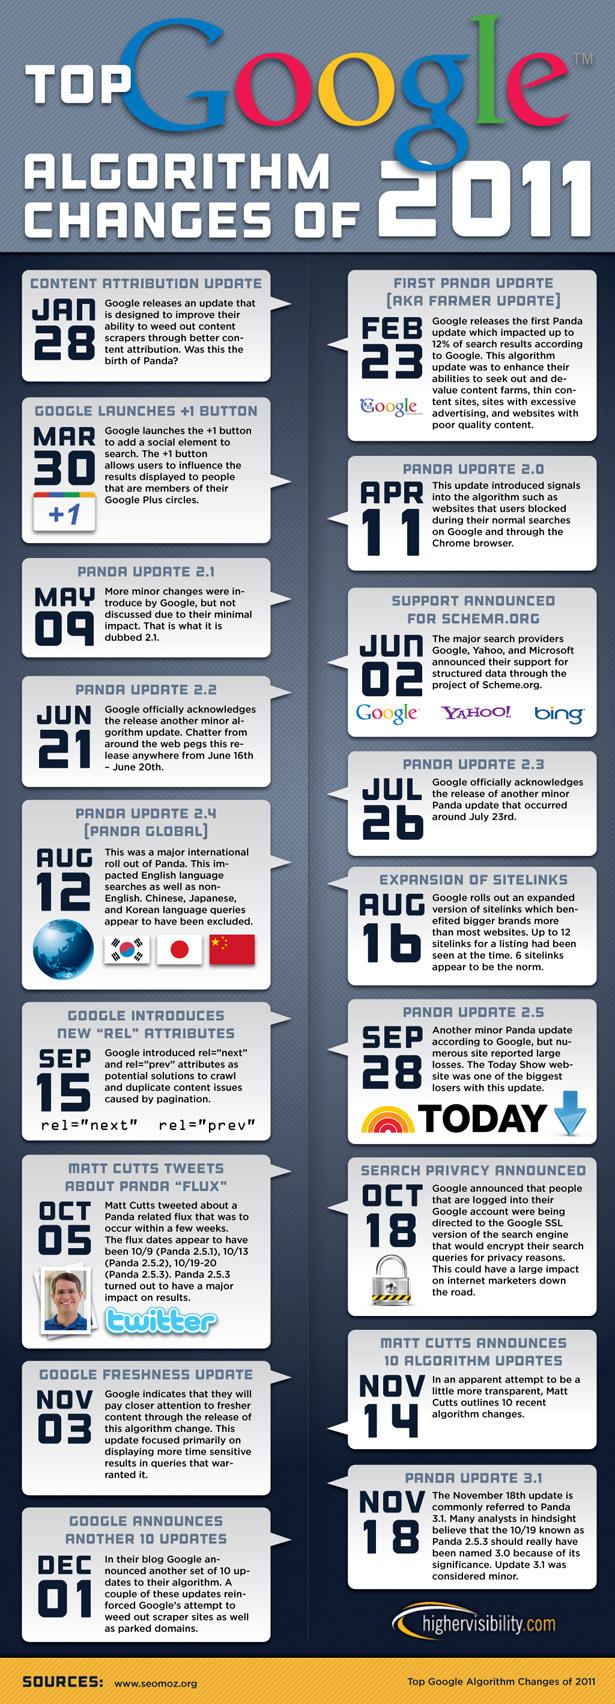 Google-Algorithm-Changes-Of-2011-infographic